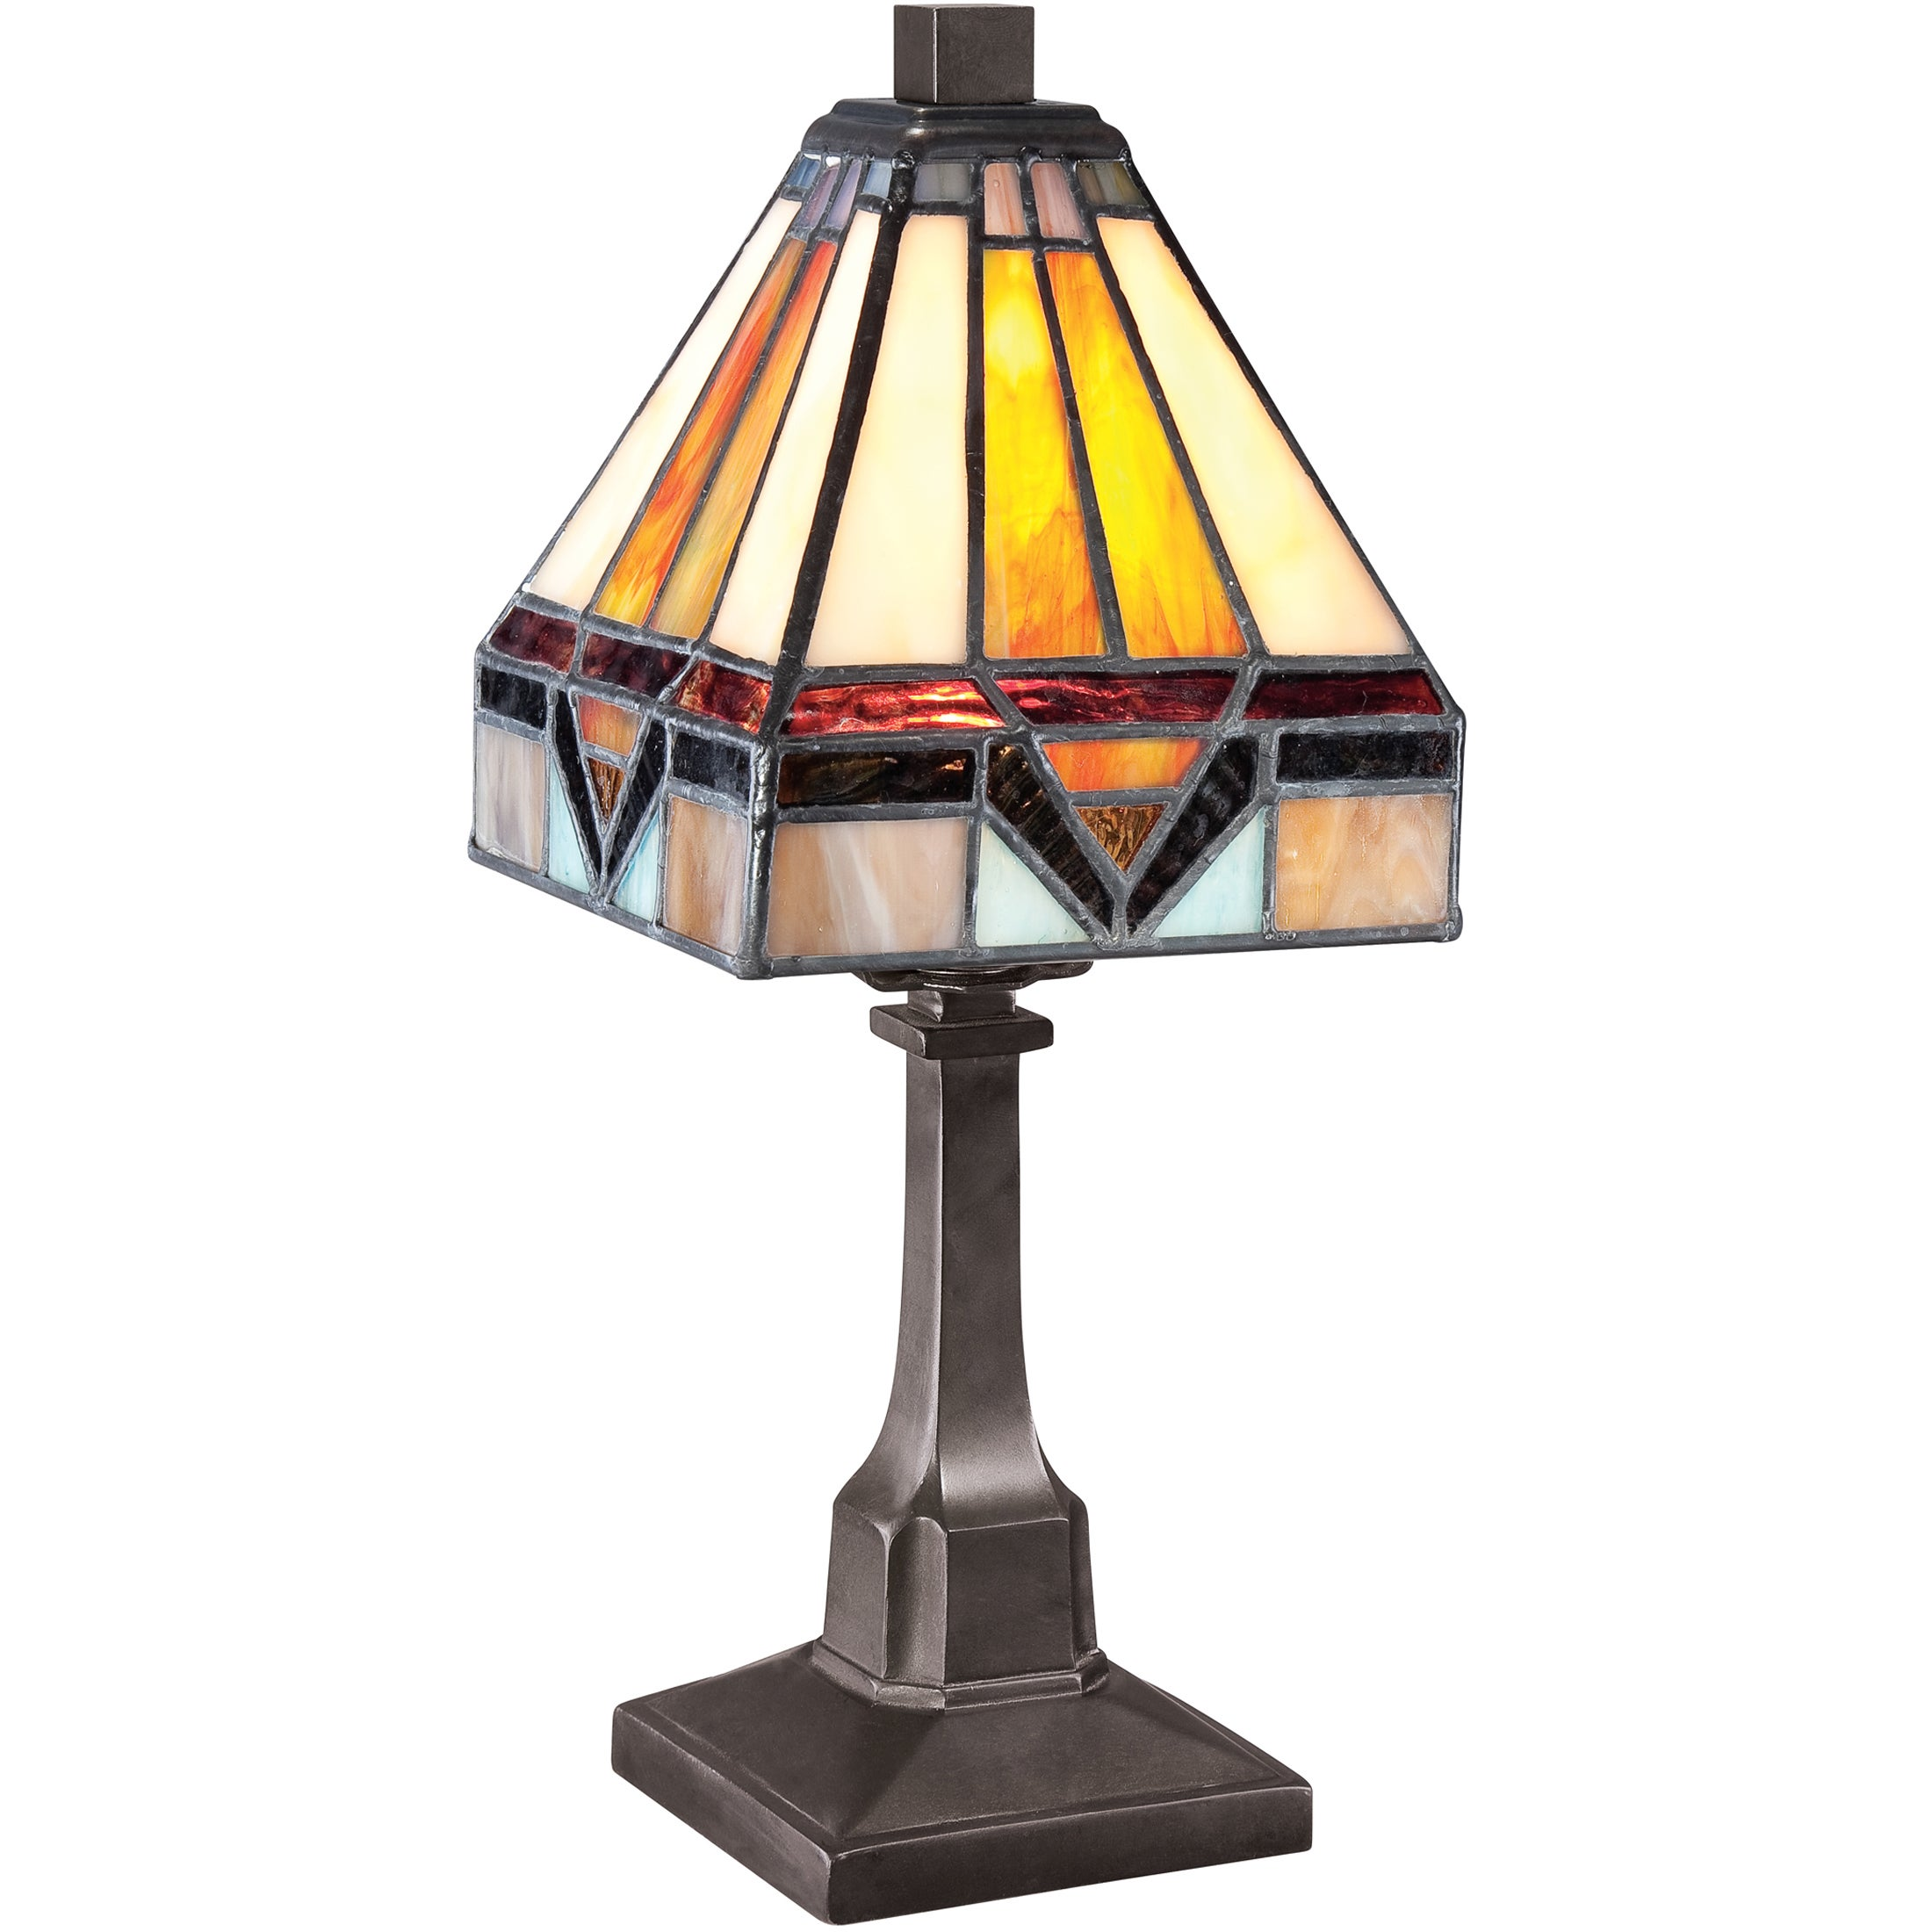 Quoizel Tiffany-style Holmes 1-light Vintage Bronze Desk Lamp